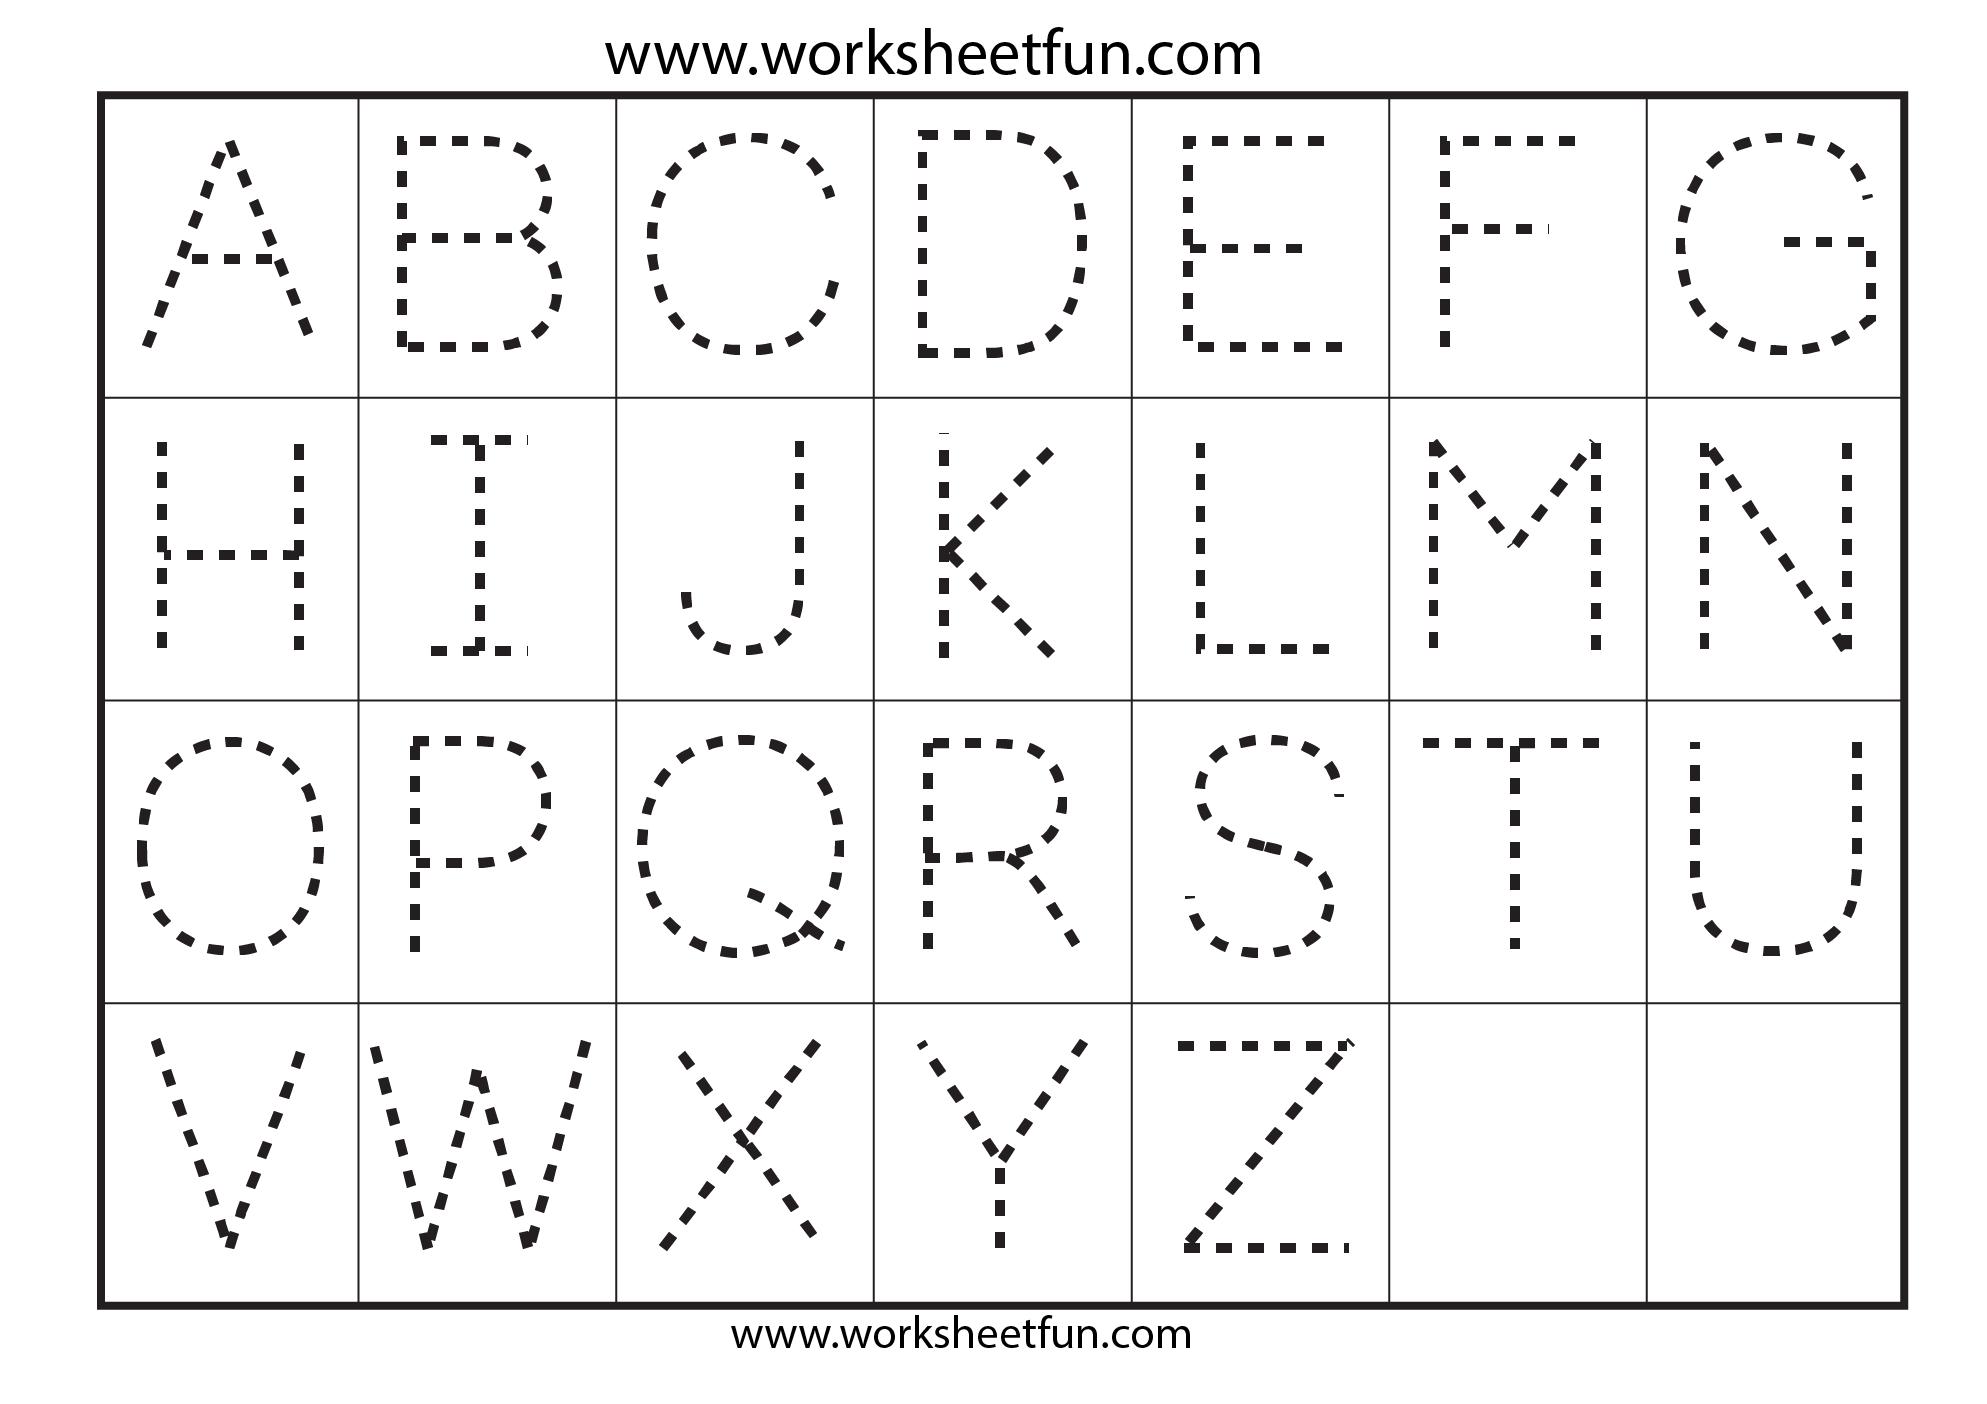 Worksheet Preschool Alphabet Worksheets A-z 6 best images of preschool printables letters a z printable worksheets alphabet tracing letter a